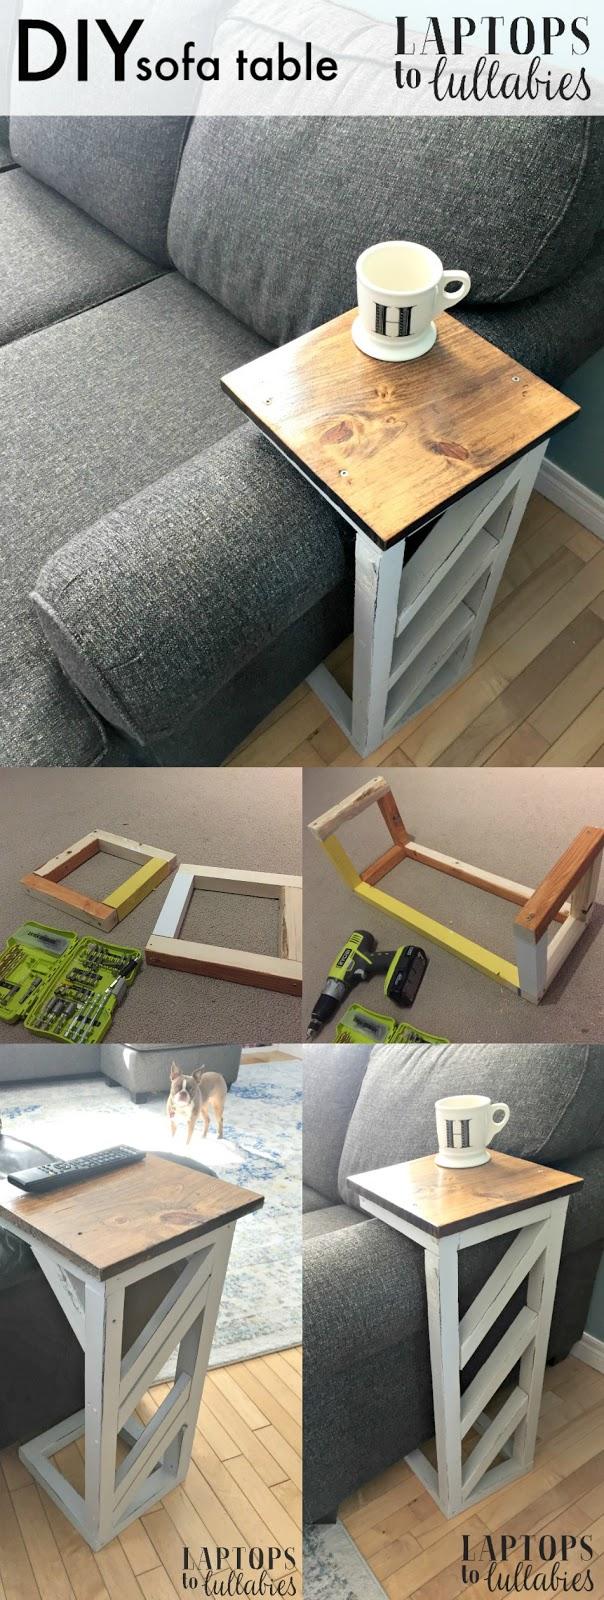 Easy Diy Sofa Tables Heather S Handmade Life